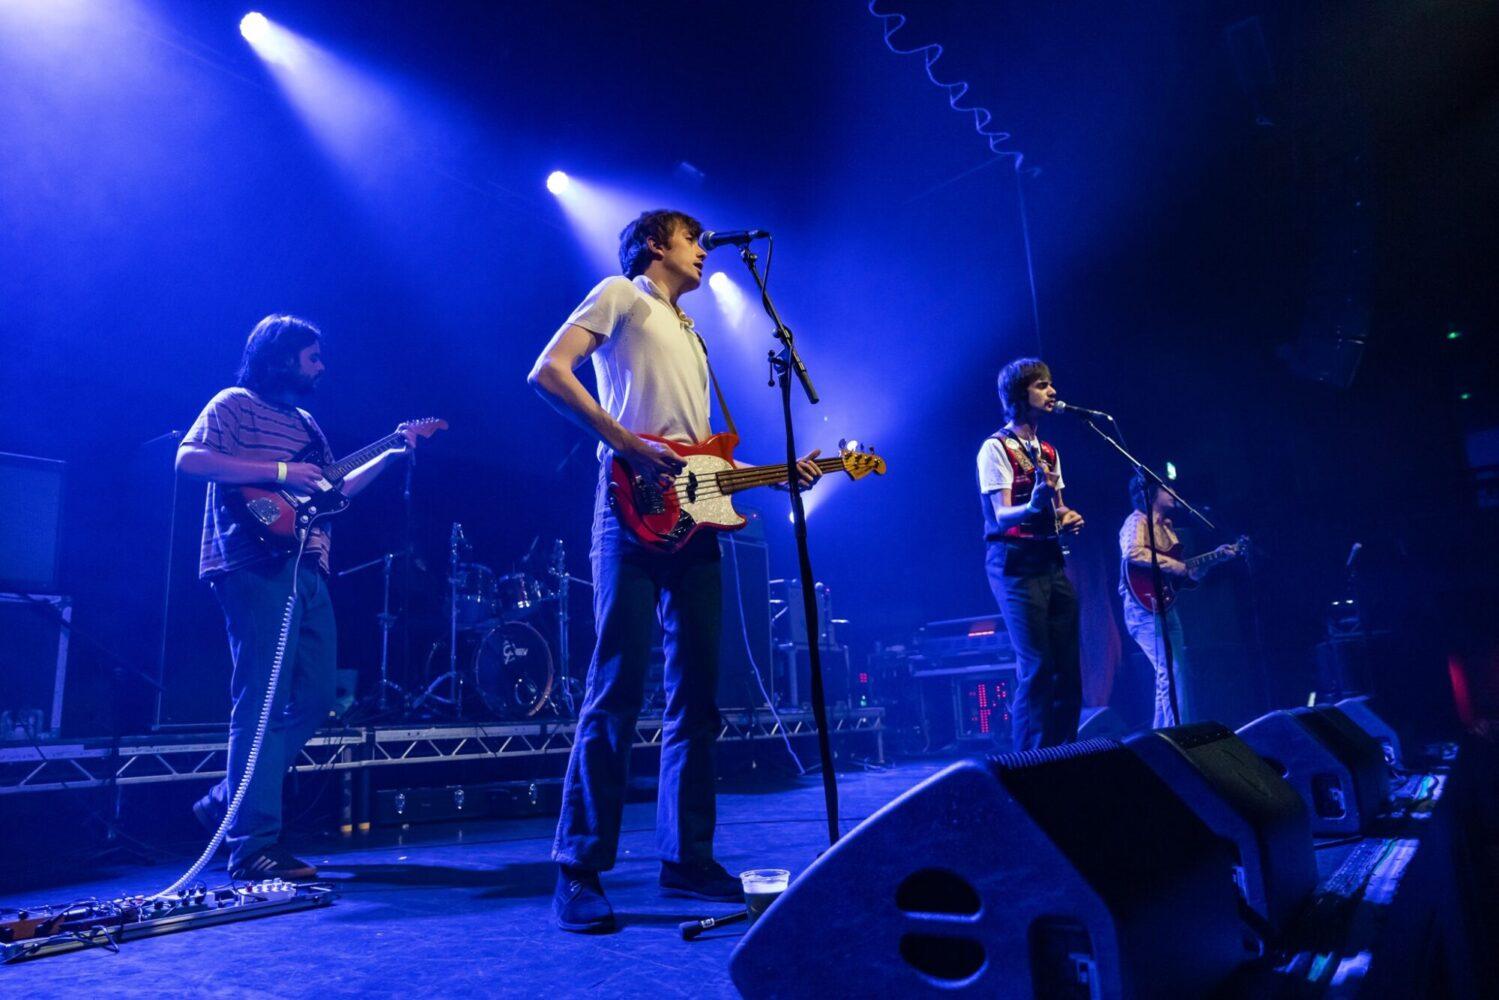 Concert For John: 02 Ritz, Manchester – live review